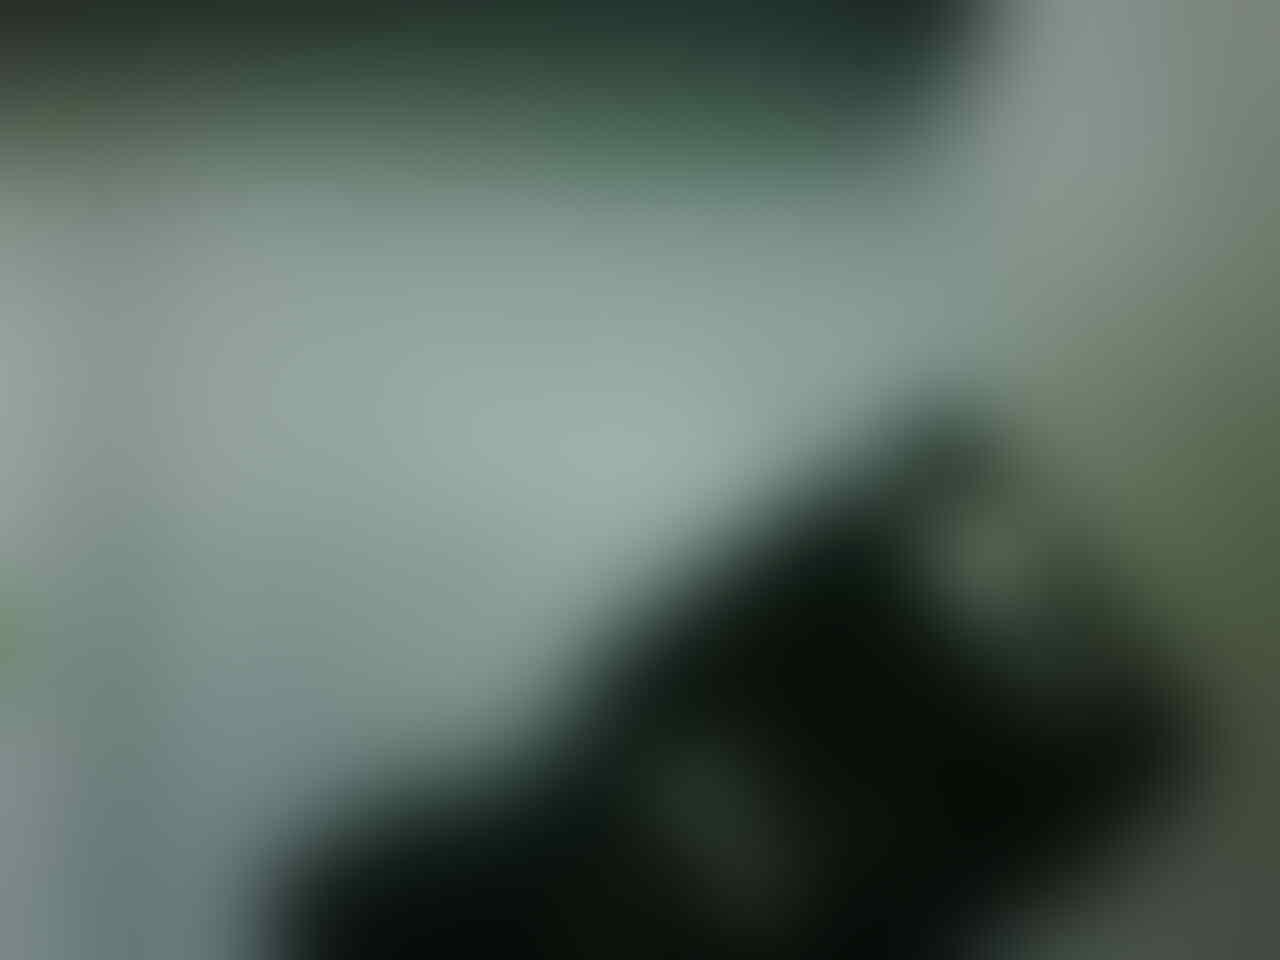 murah...Motorola Droid Razr XT912 SUDAH ICS MAntep